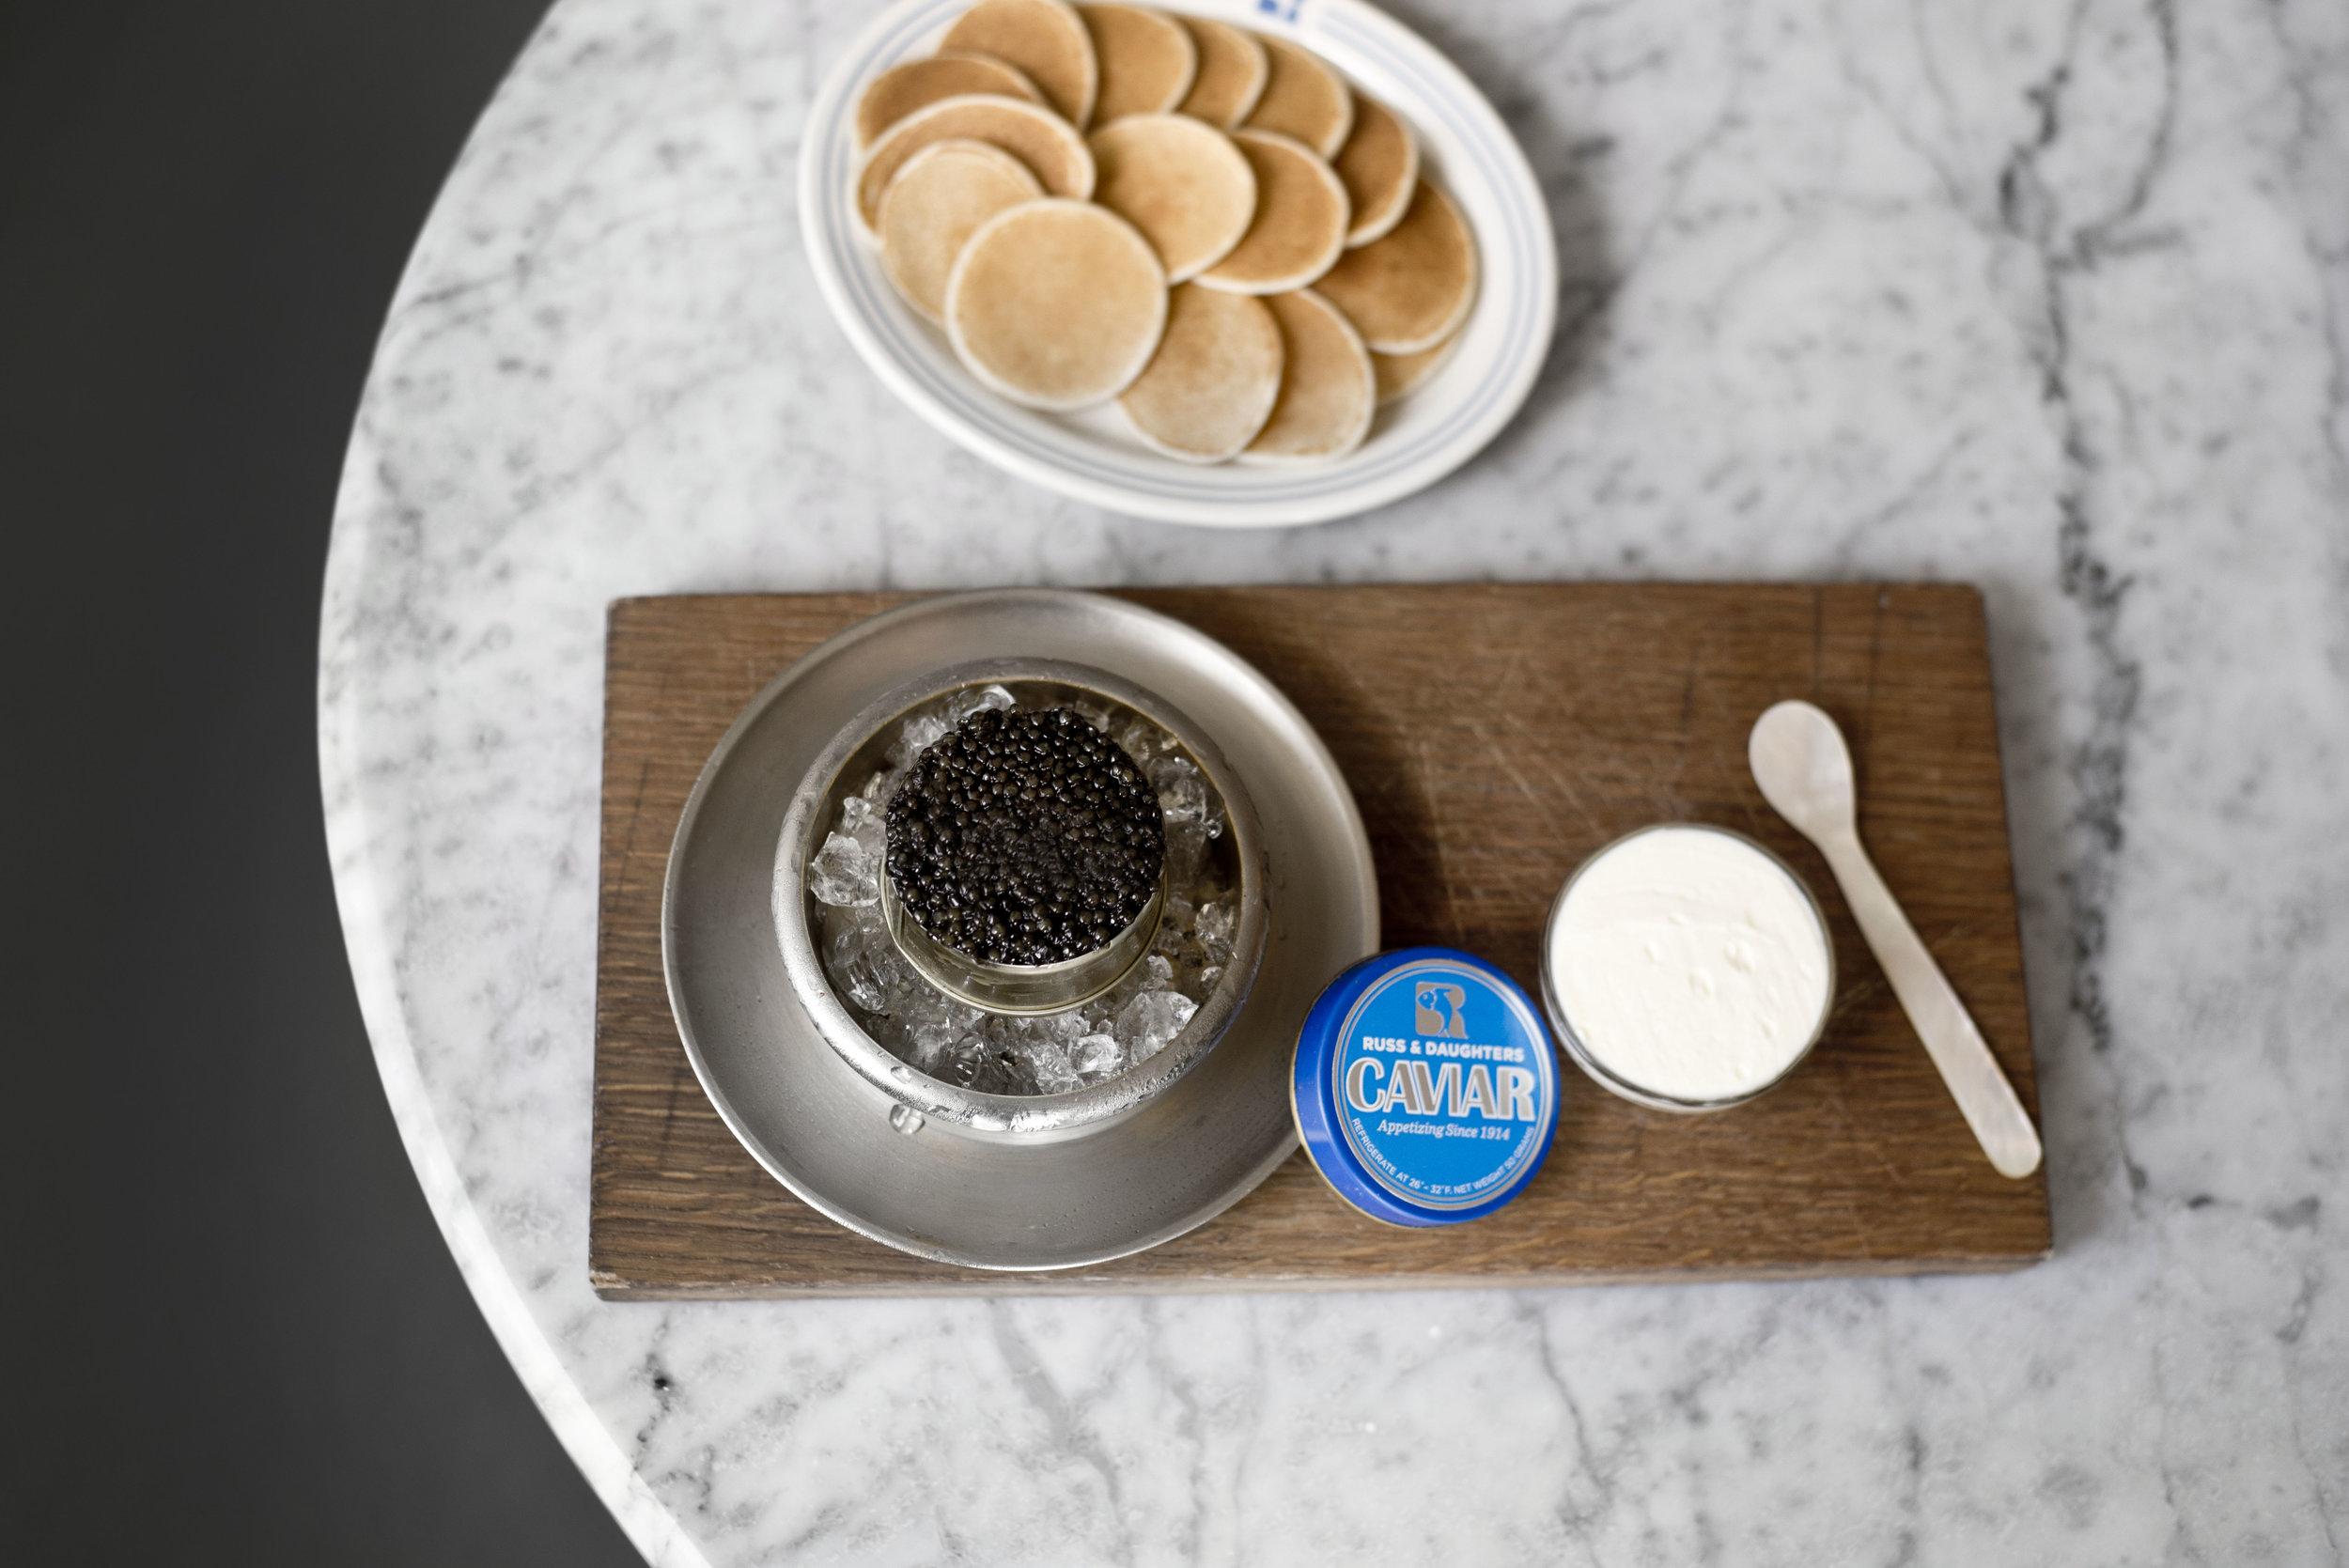 Russ & Daughters Cafe caviar.jpg